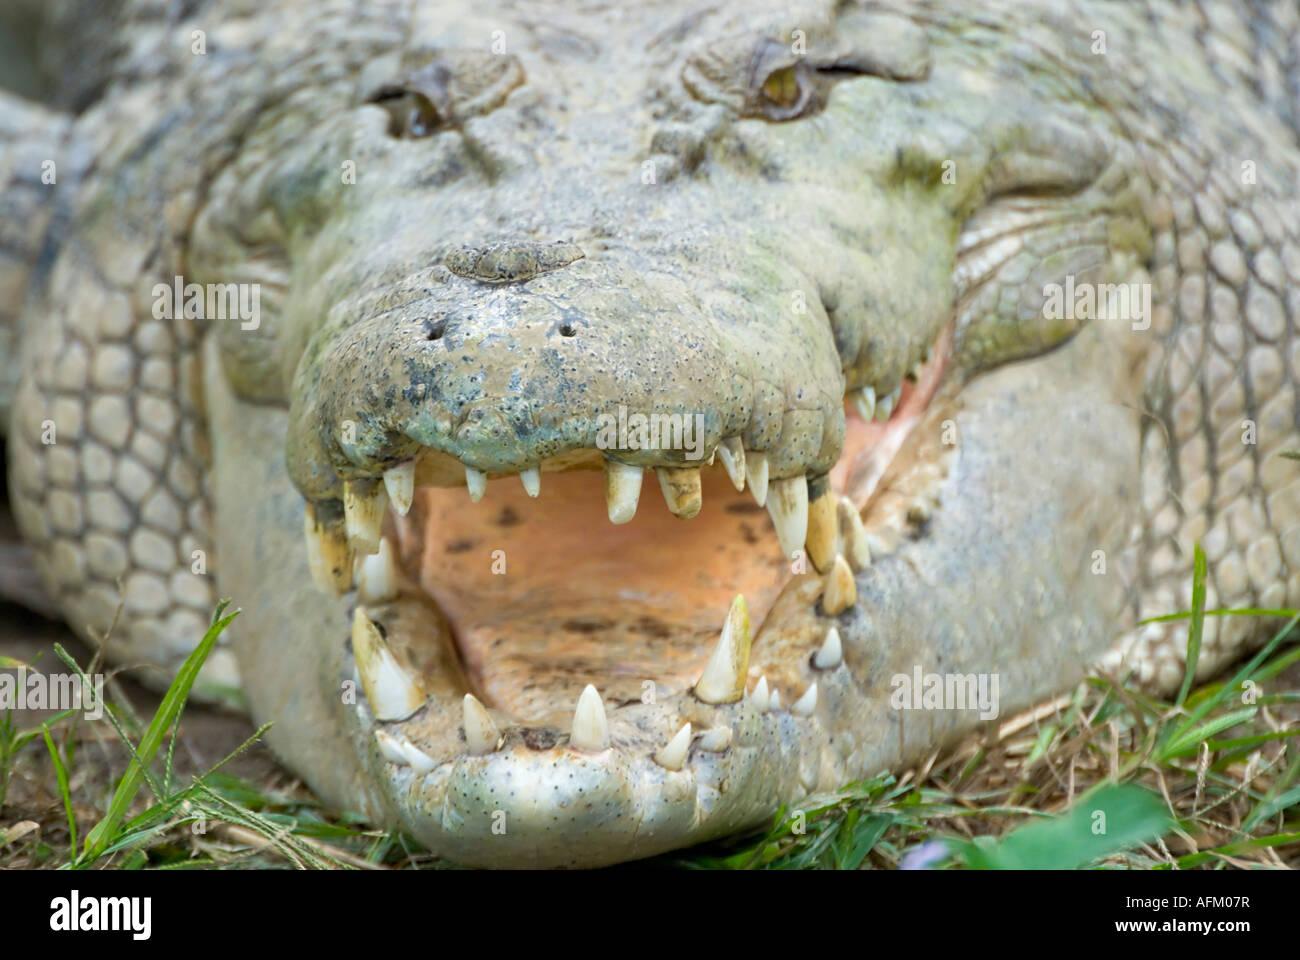 Estuarine Saltwater Crocodile, Queensland, Australia - Stock Image